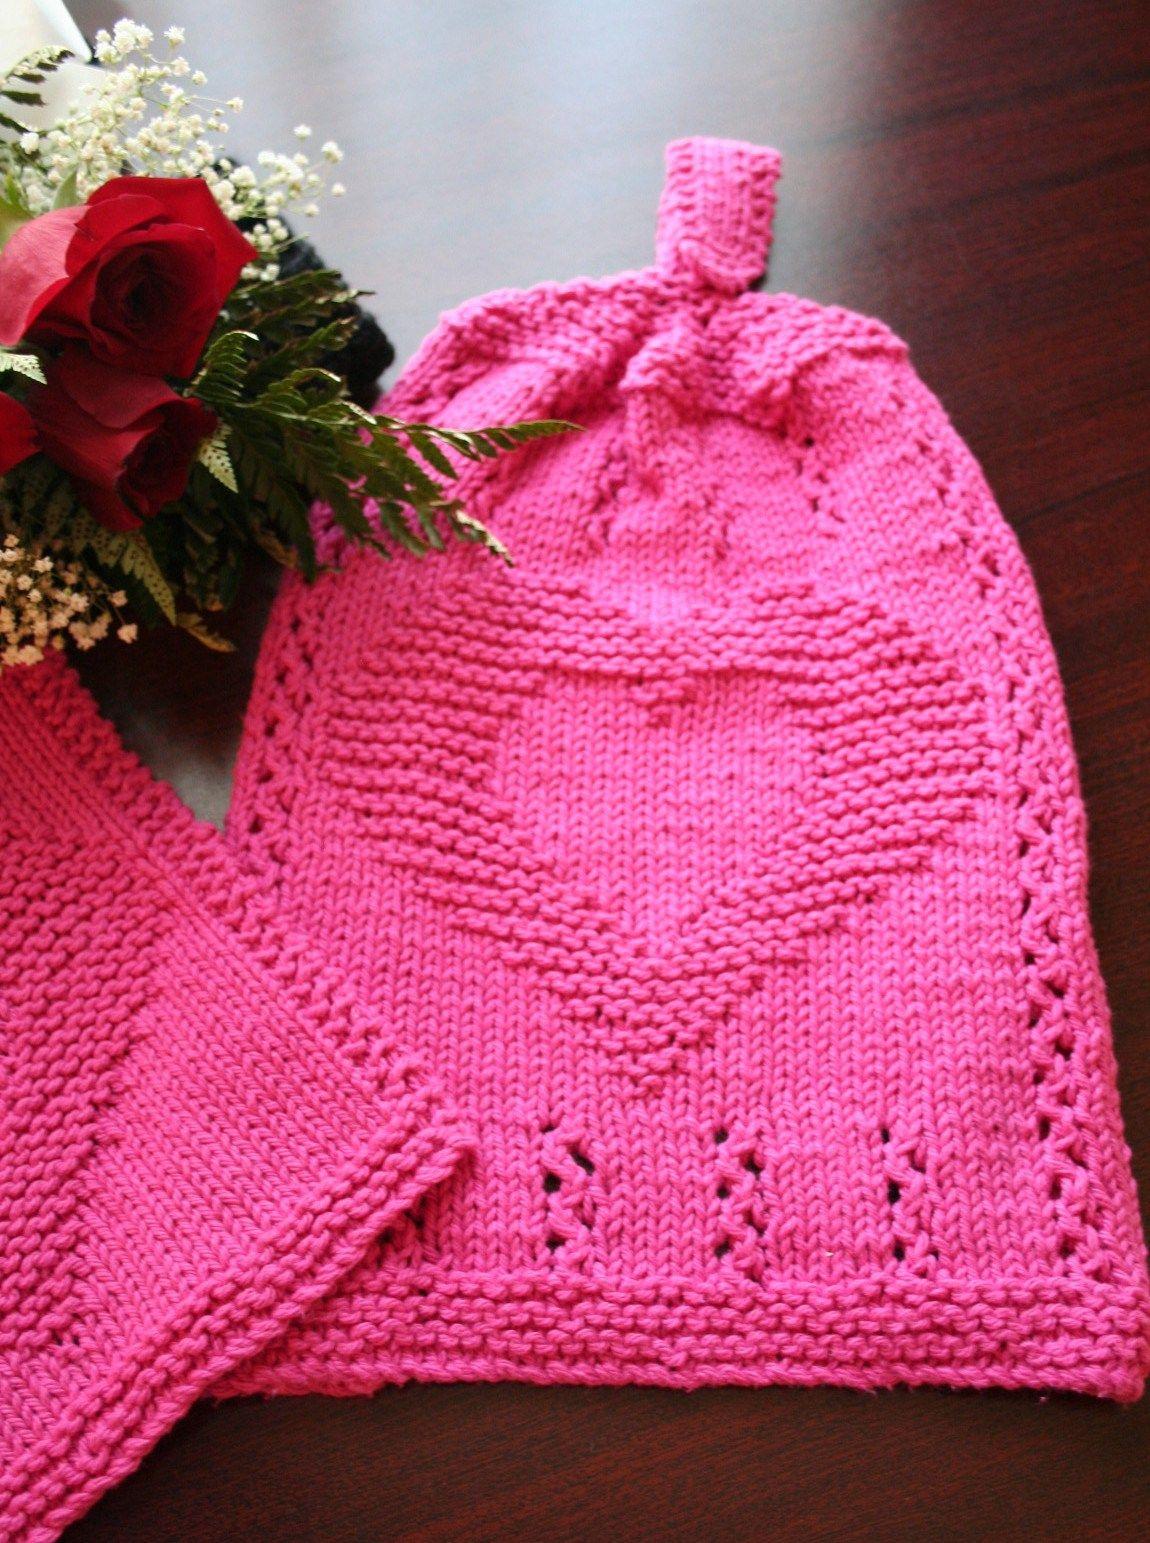 Dishcloth and Washcloth Knitting Patterns | Pinterest | Hanging ...